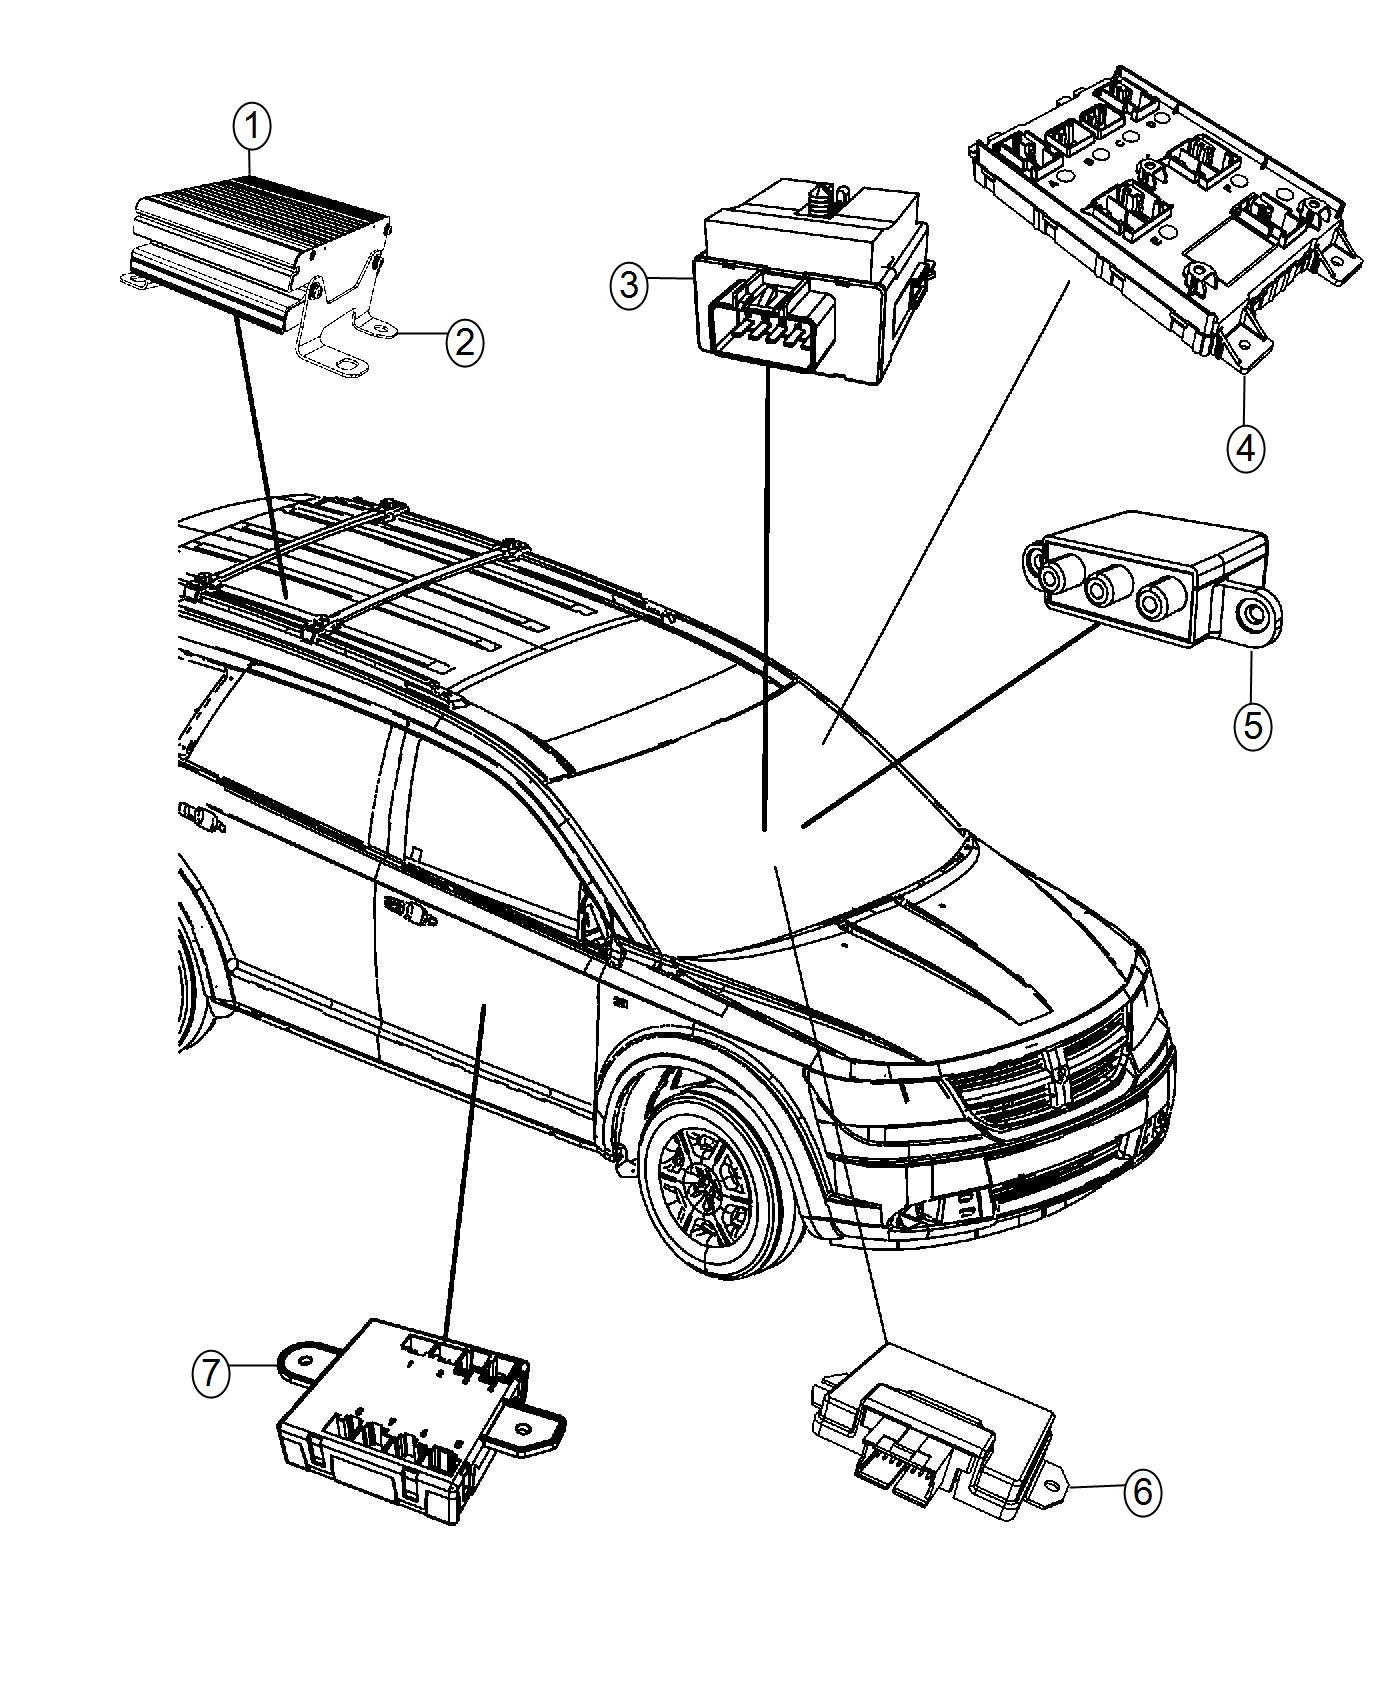 2017 Dodge Journey Module. Drive train control. Modules